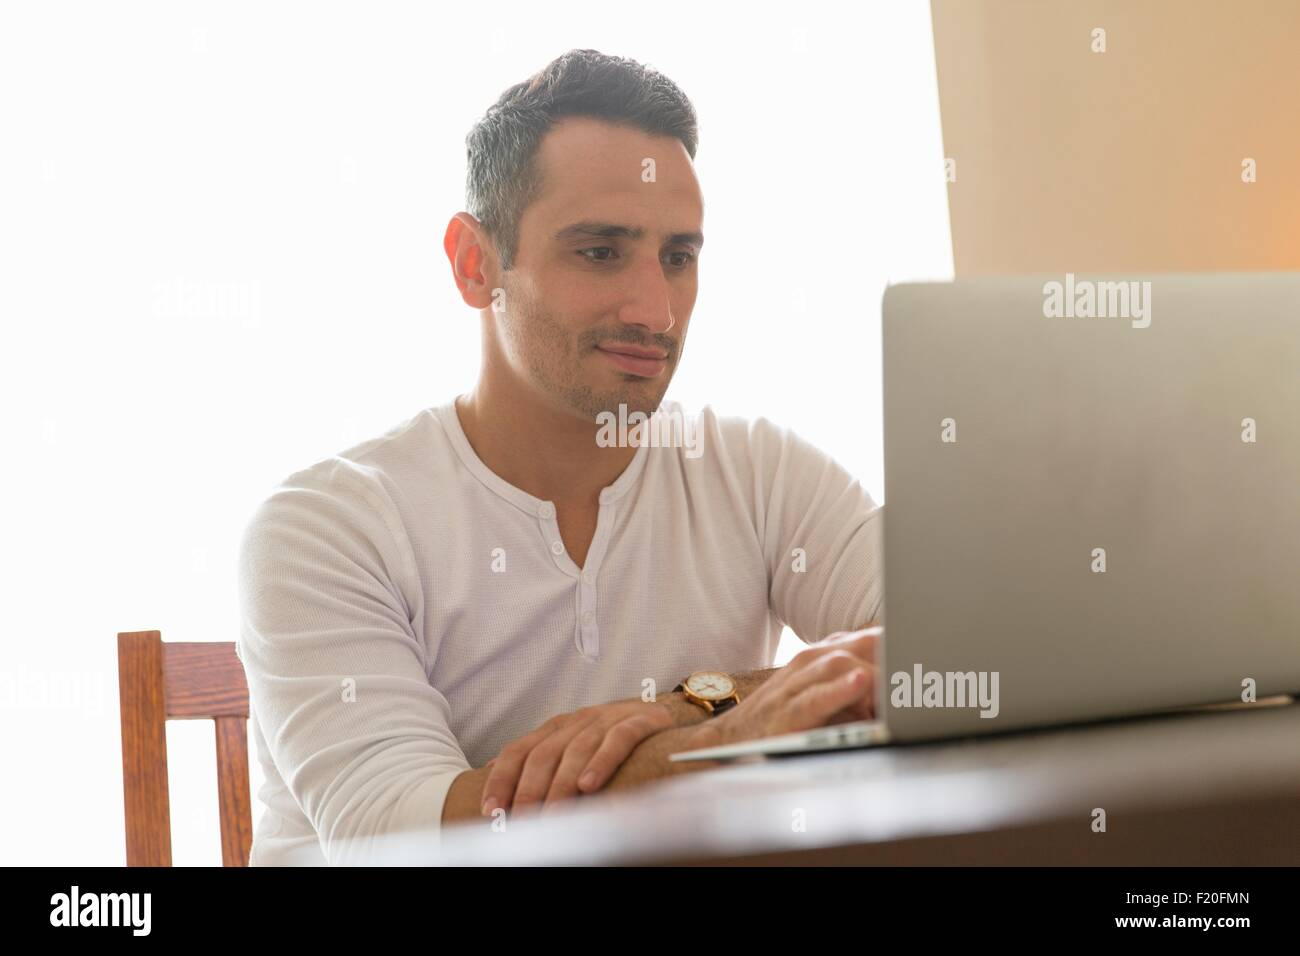 Mid adult man sitting at desk, using laptop - Stock Image